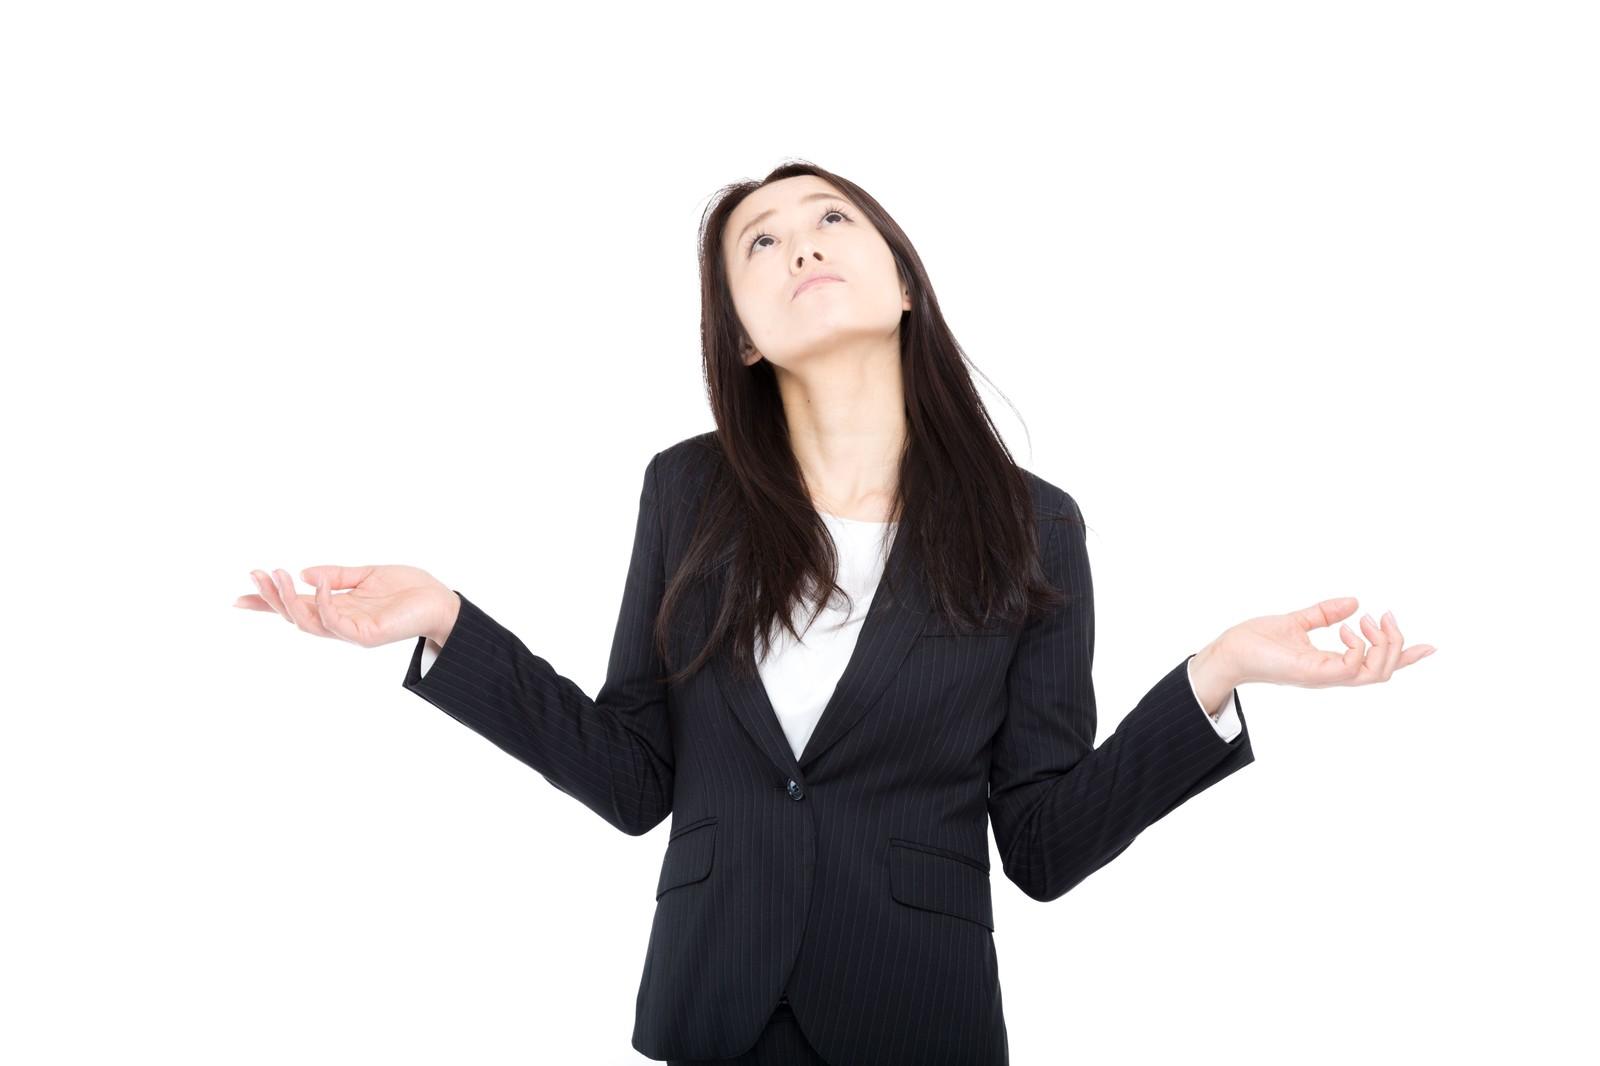 IT業界未経験なら派遣社員でスタートしよう!派遣の7つのメリット